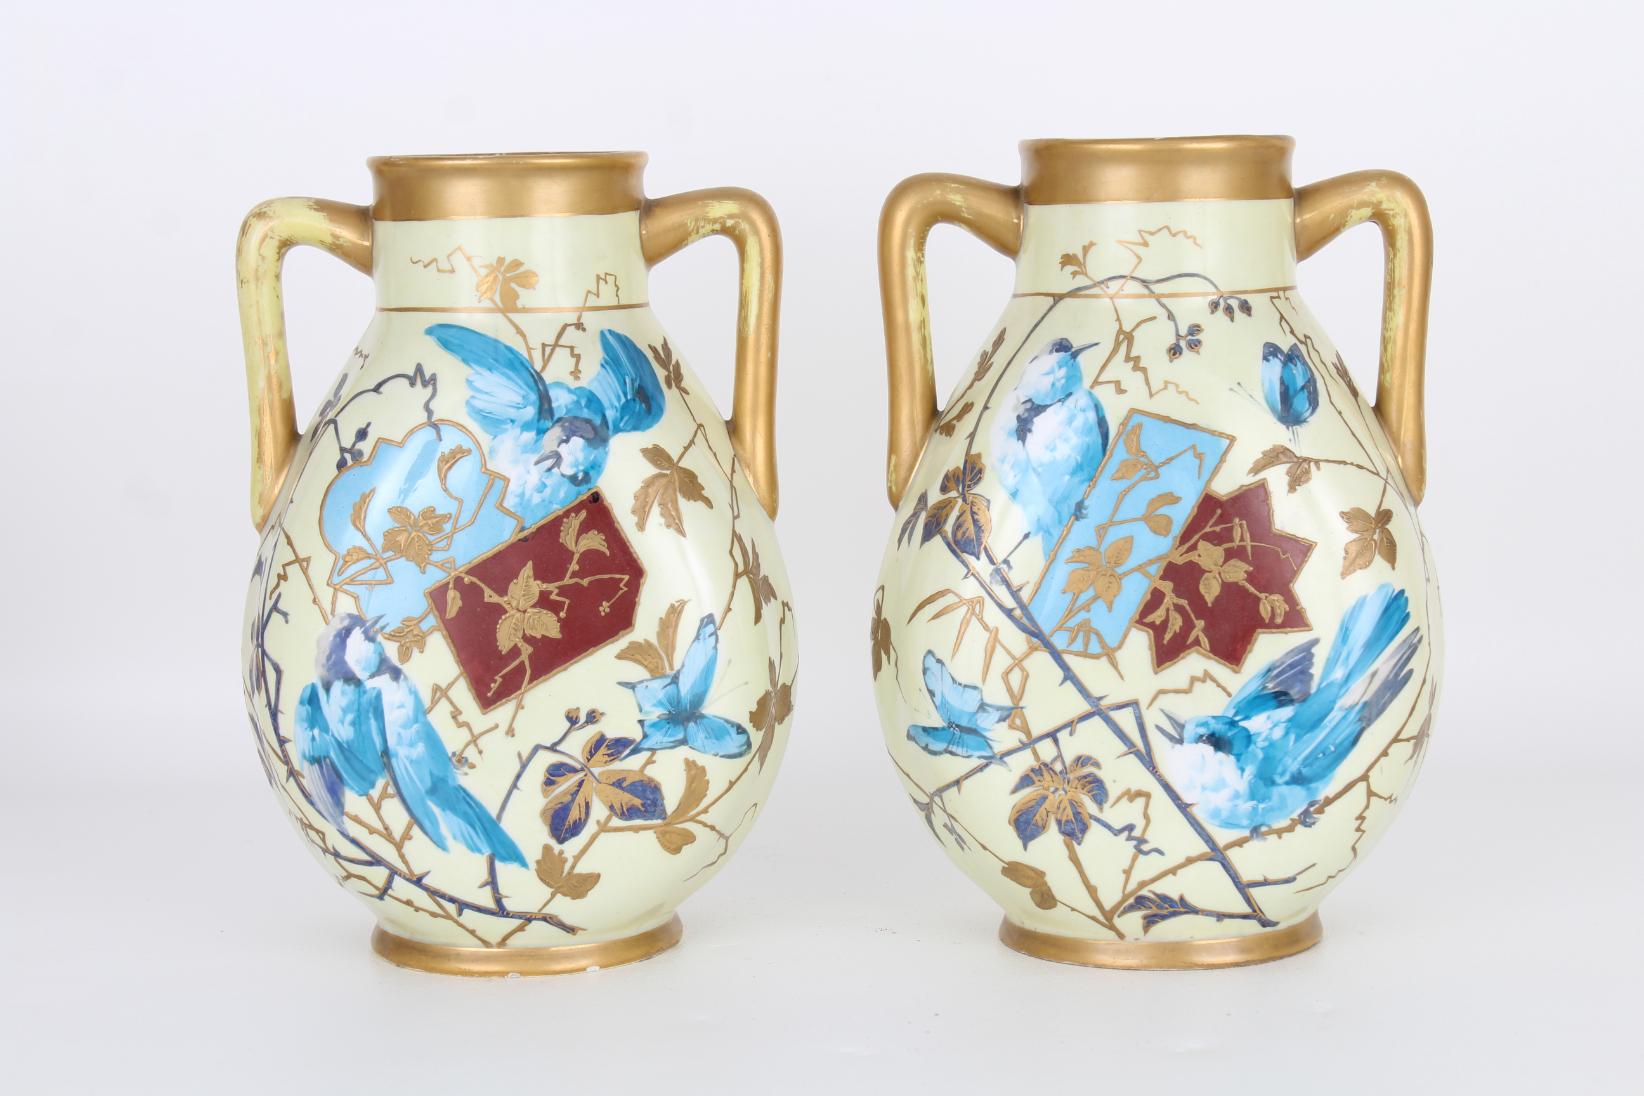 Pair, Antique French Aesthetic Period Vases